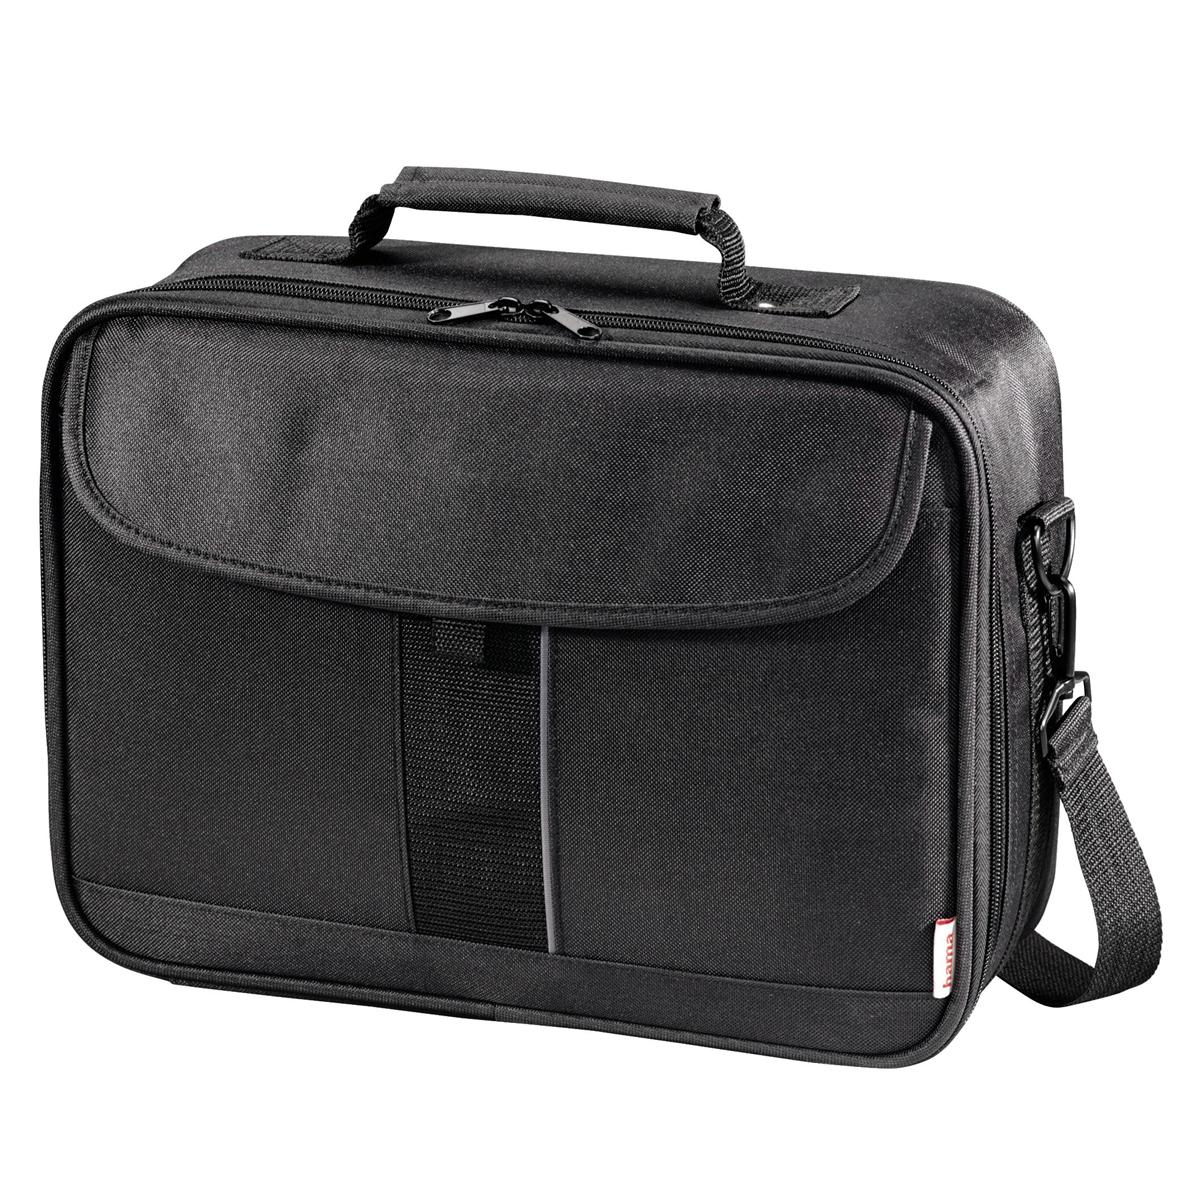 Hama Sportsline Padded Projector Bag Large W390xD270xH150mm Black Ref 101066